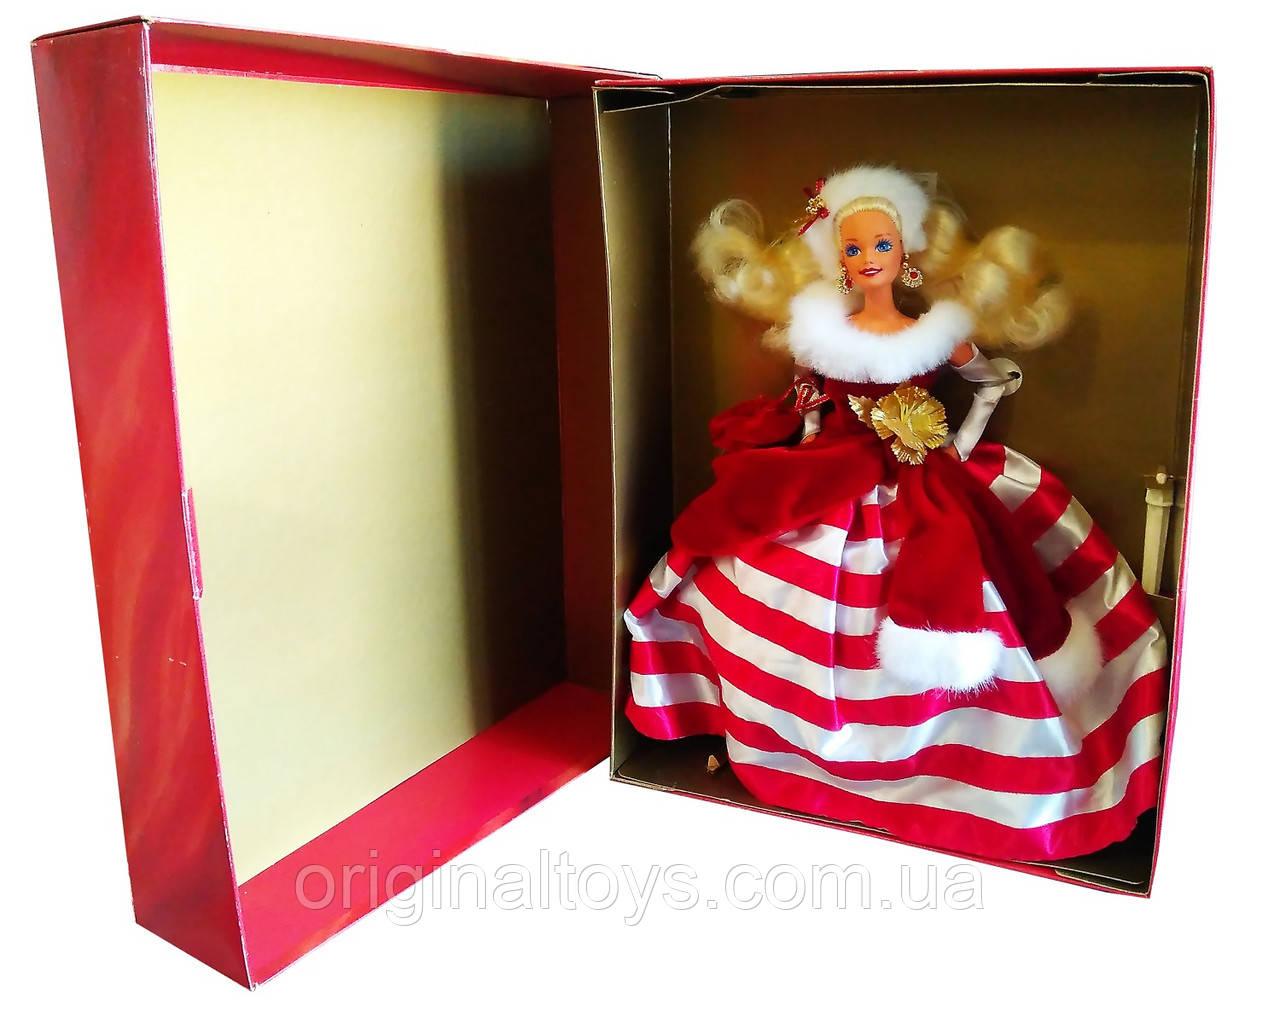 Коллекционная кукла Барби Мятная принцесса Barbie Peppermint Princess 1994 Mattel 13598